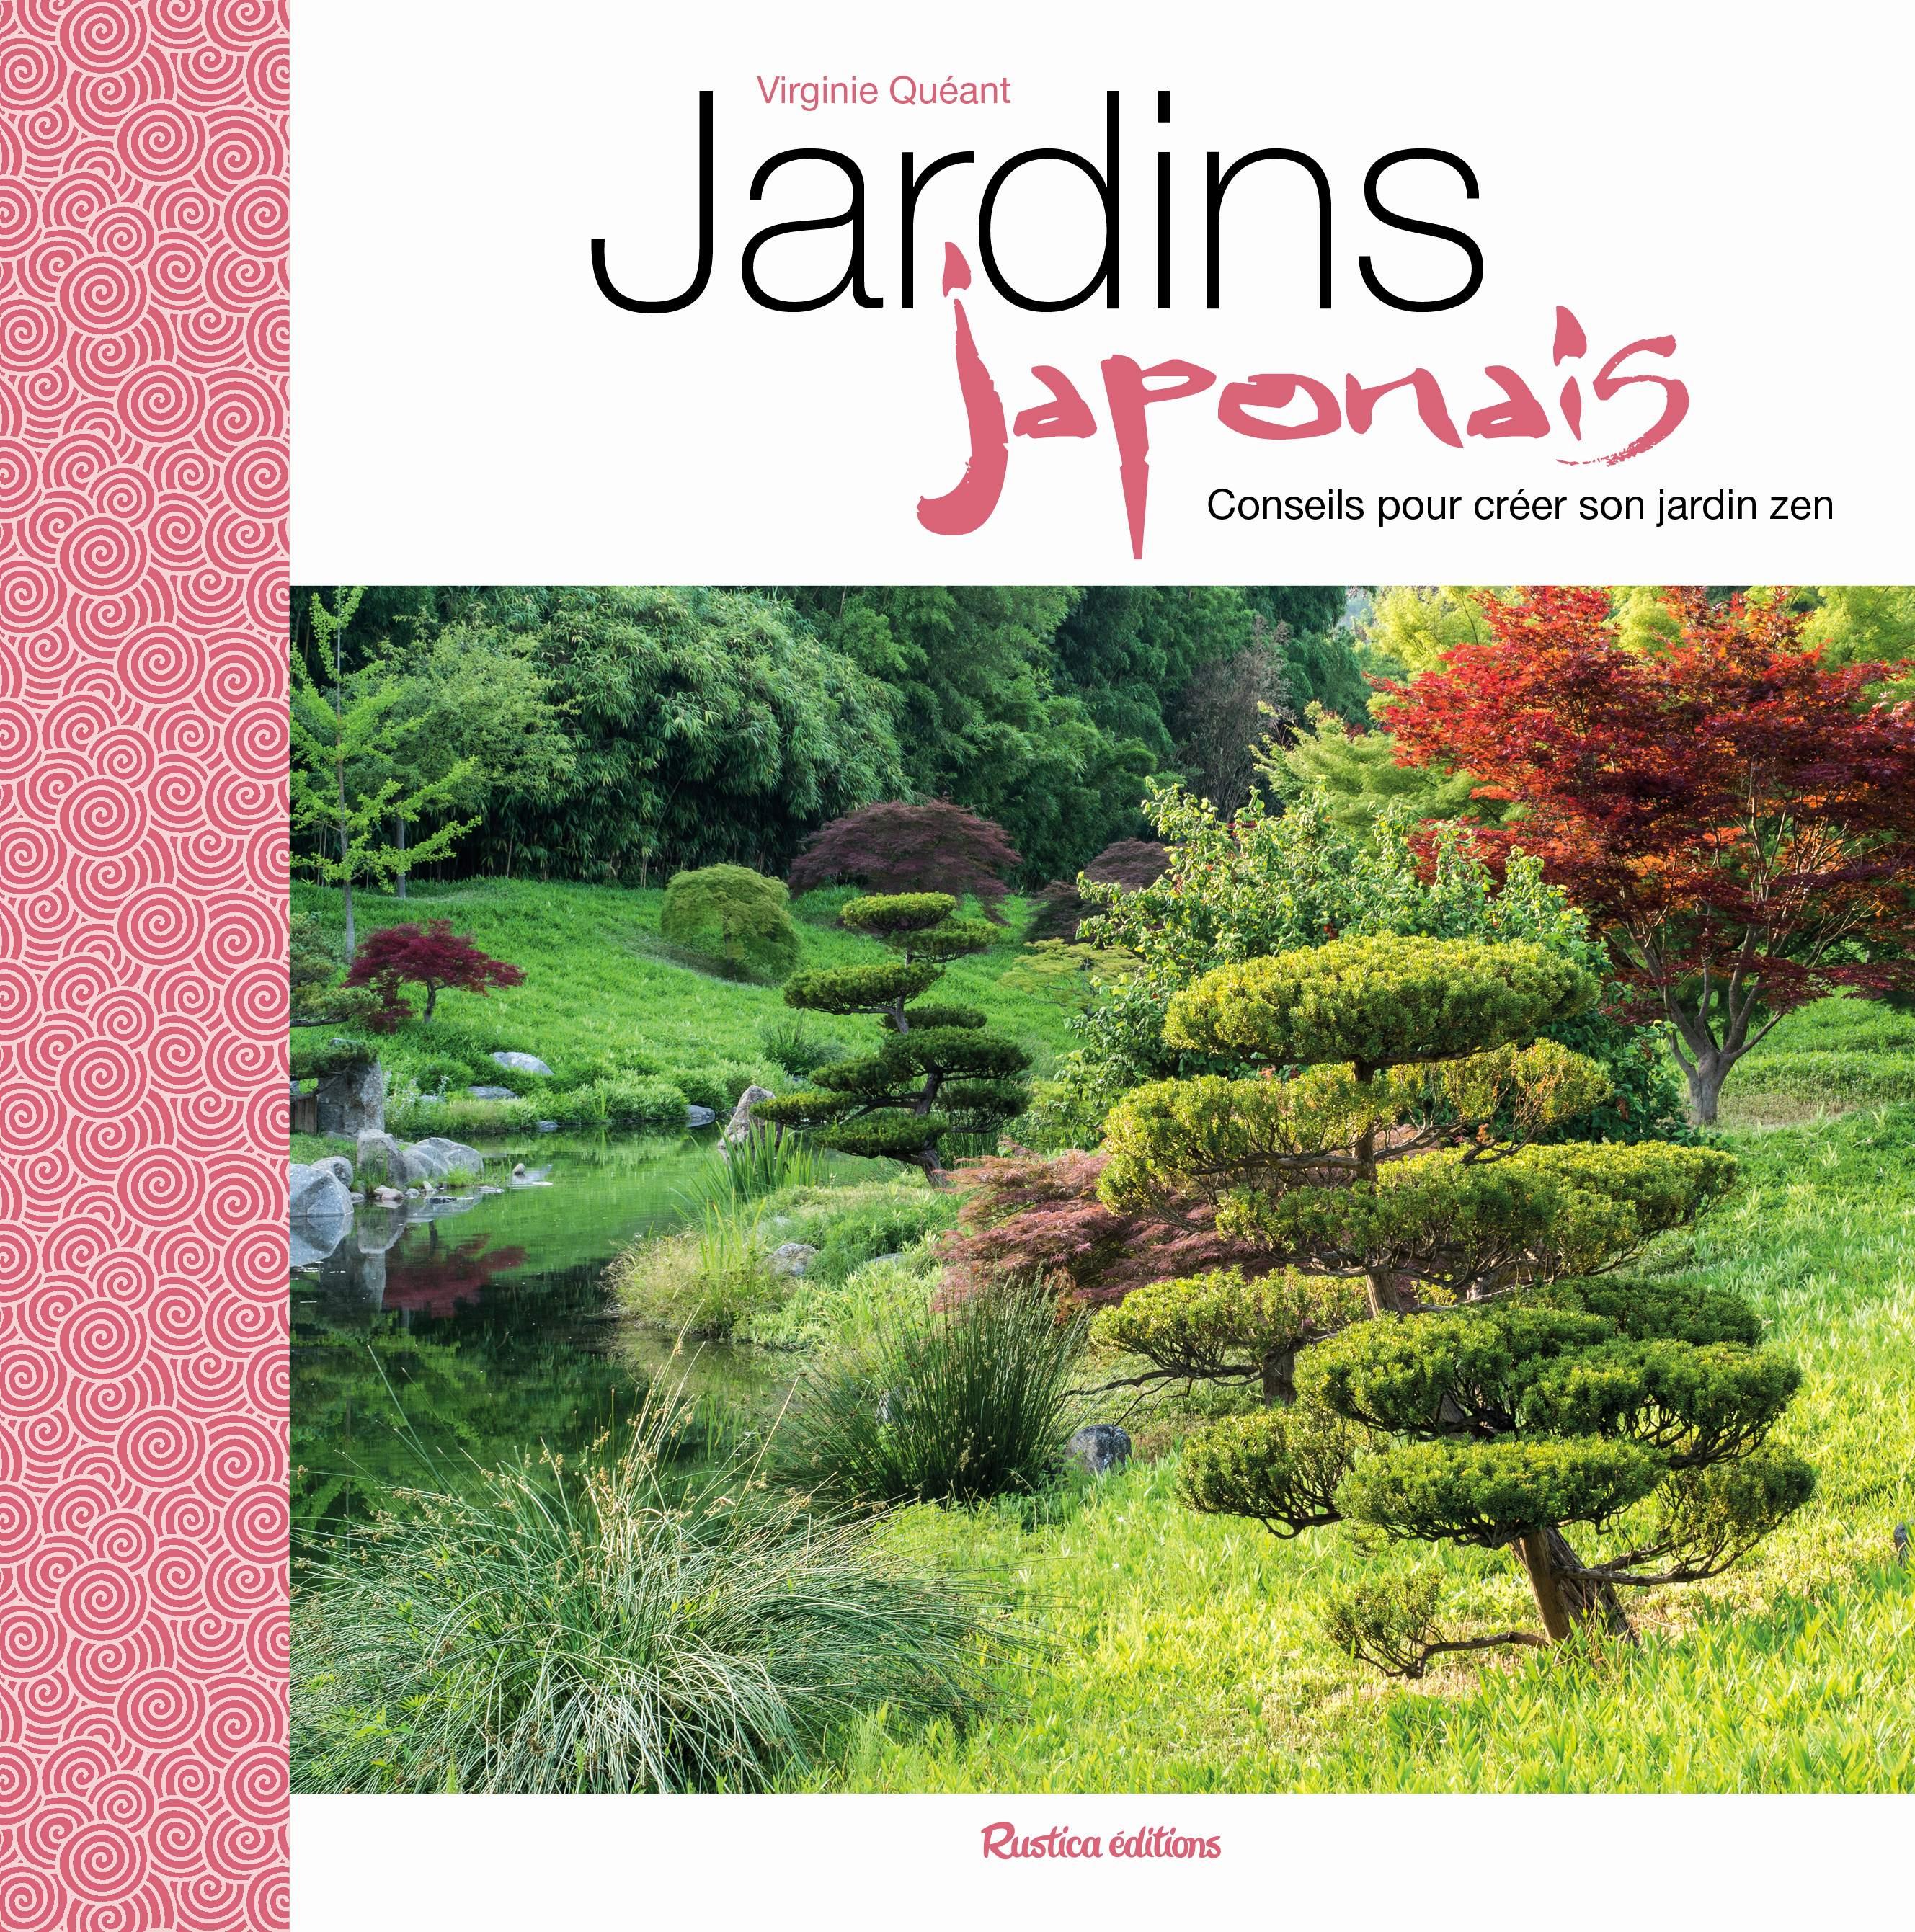 Vive Le Jardin Granville Inspirant Photos Galerie De Cuisine Jardin 40chienmingwang